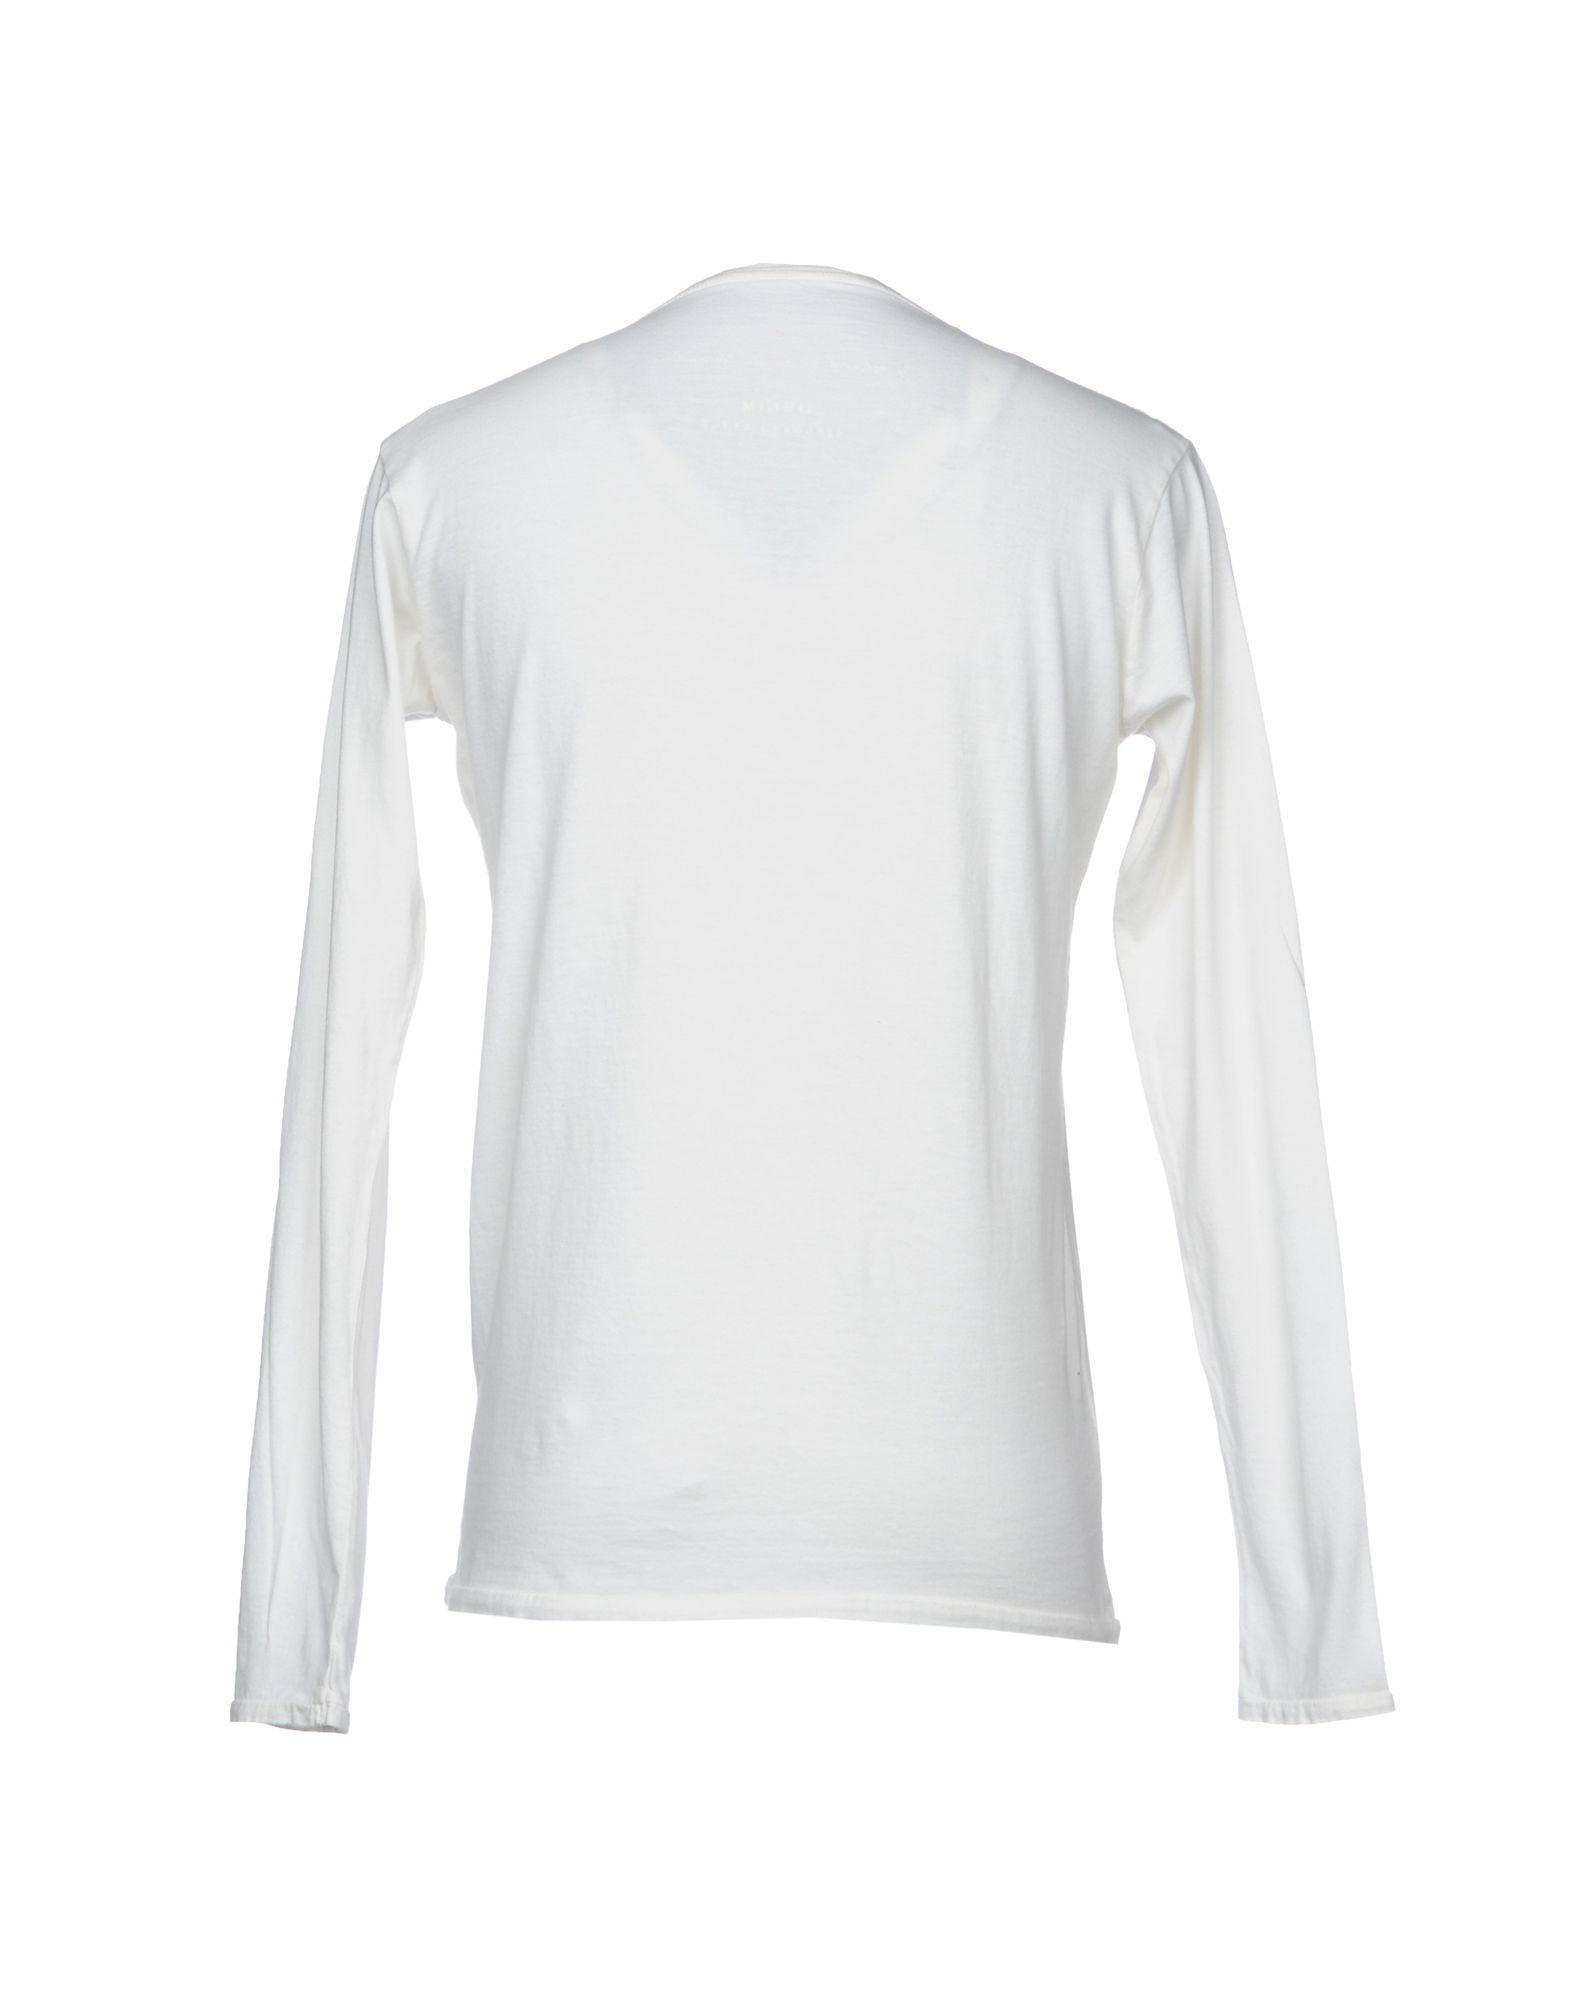 T-Shirt Daniele Alessandrini Uomo 12124642GR - 12124642GR Uomo caa693